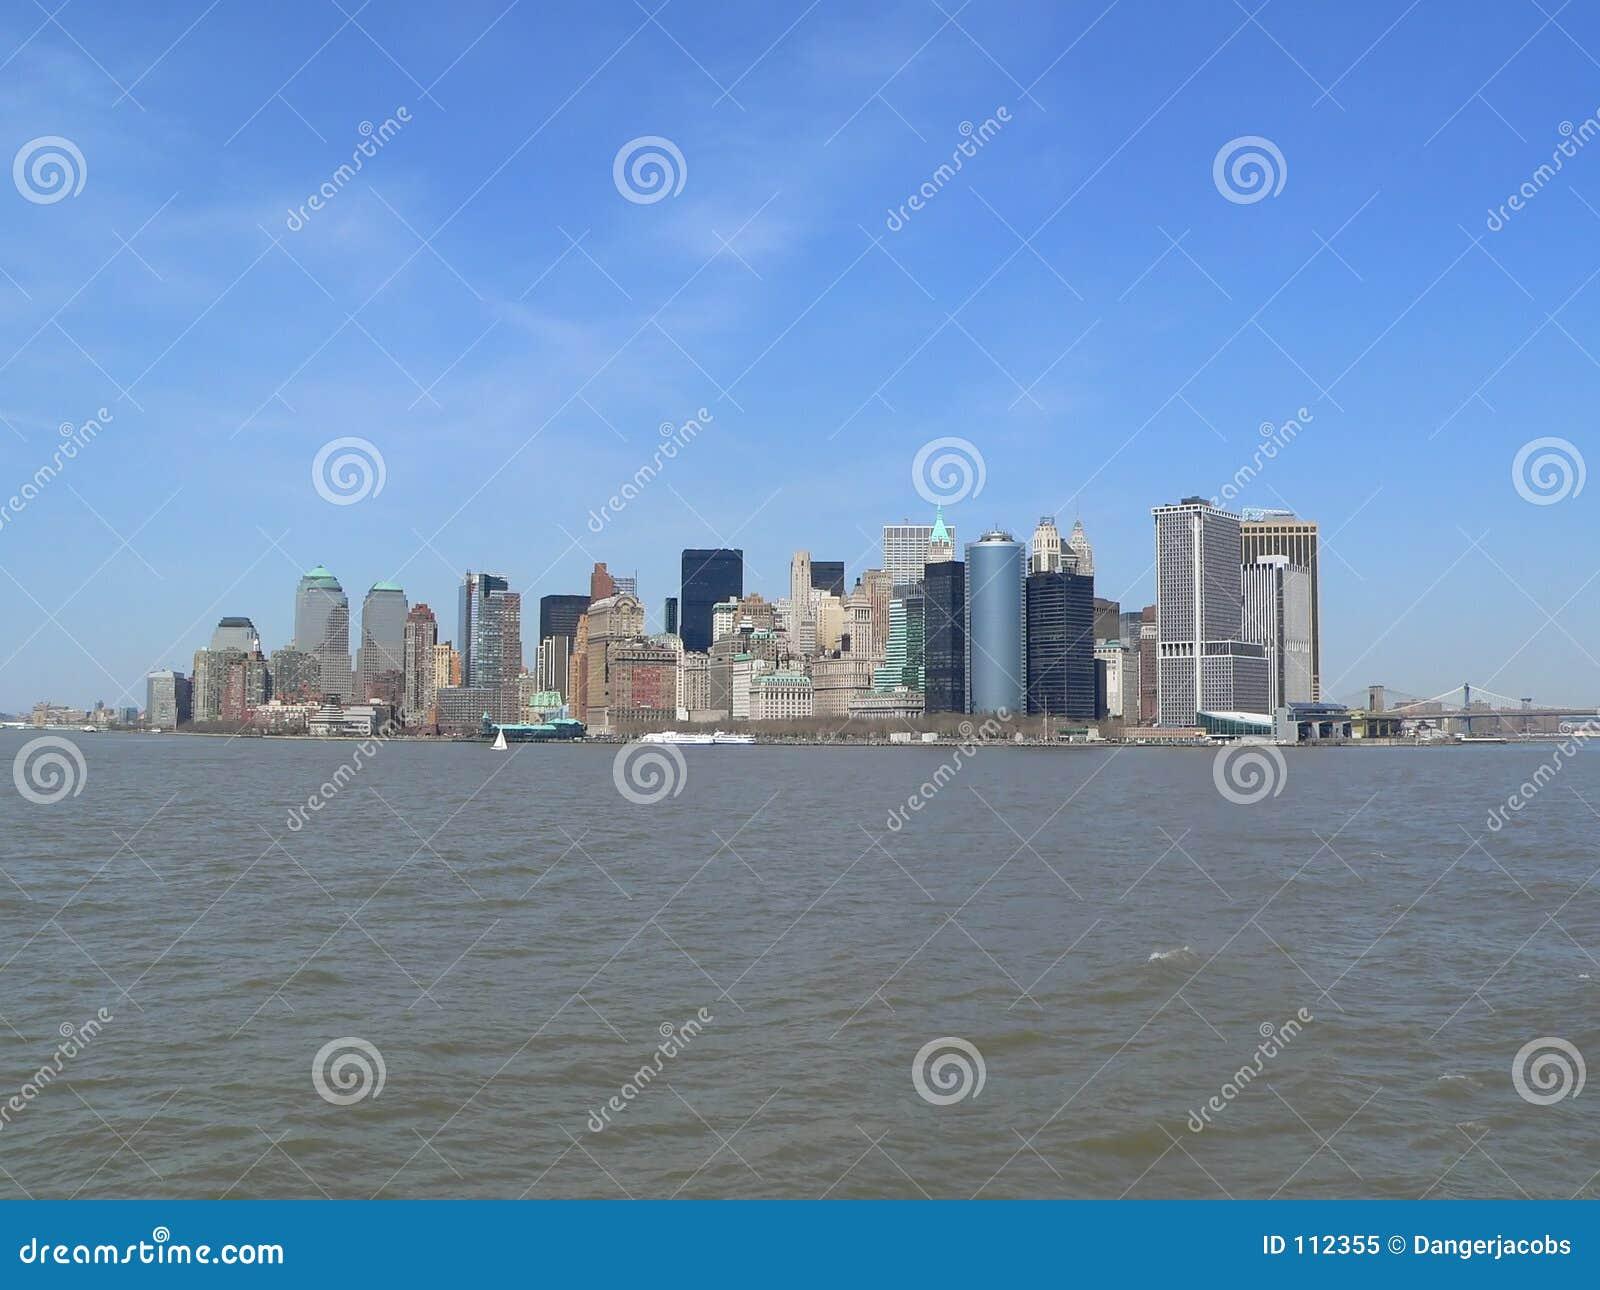 Office building, apartment building, skyscraper, fill Manhattan, New York City Skyline